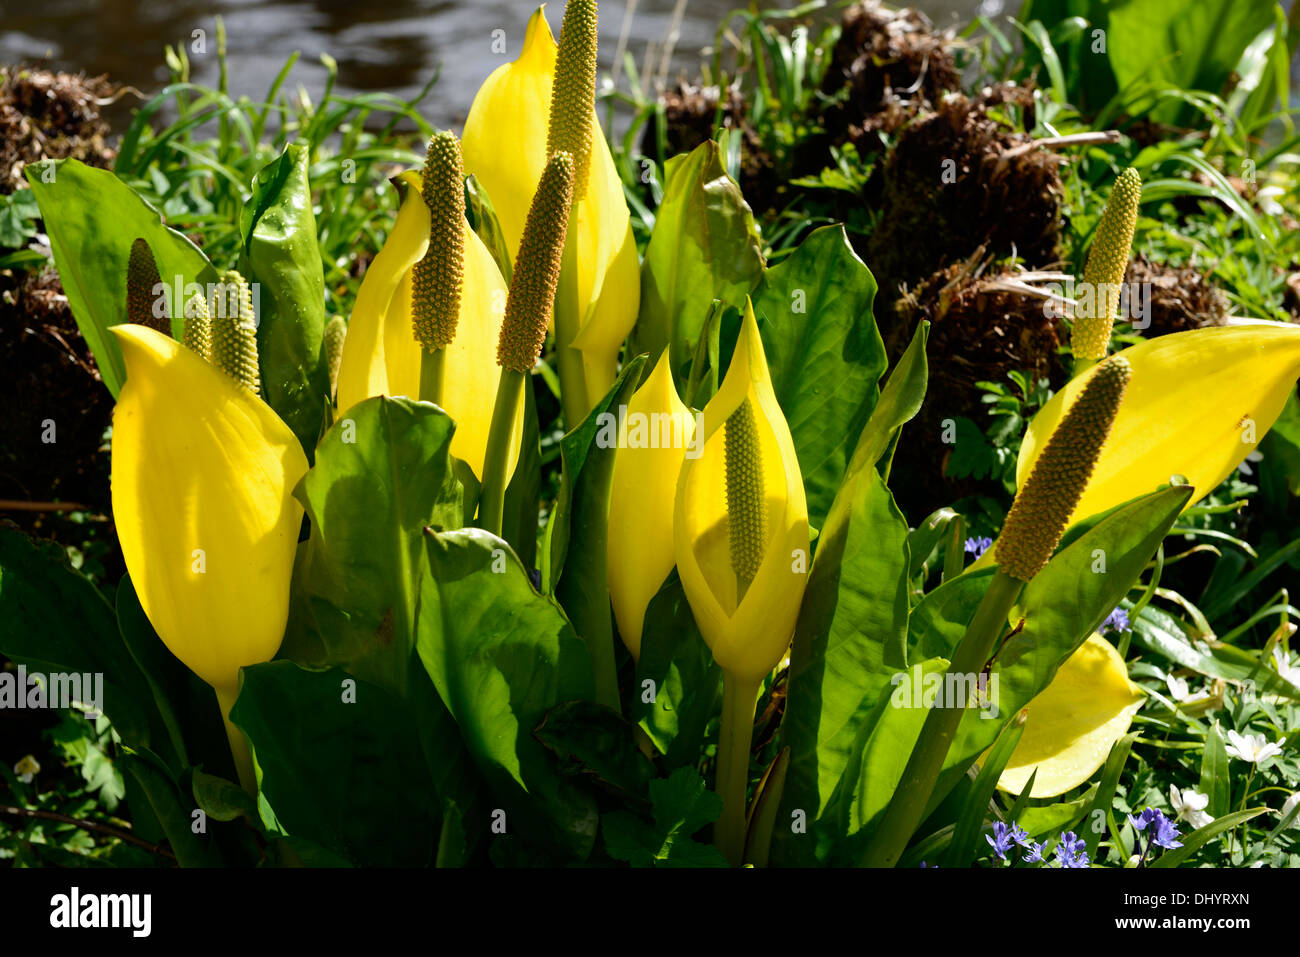 Lysichiton americanus yellow skunk cabbage flowers flowering bloom blooming spring perennials bog water aquatic plants Stock Photo